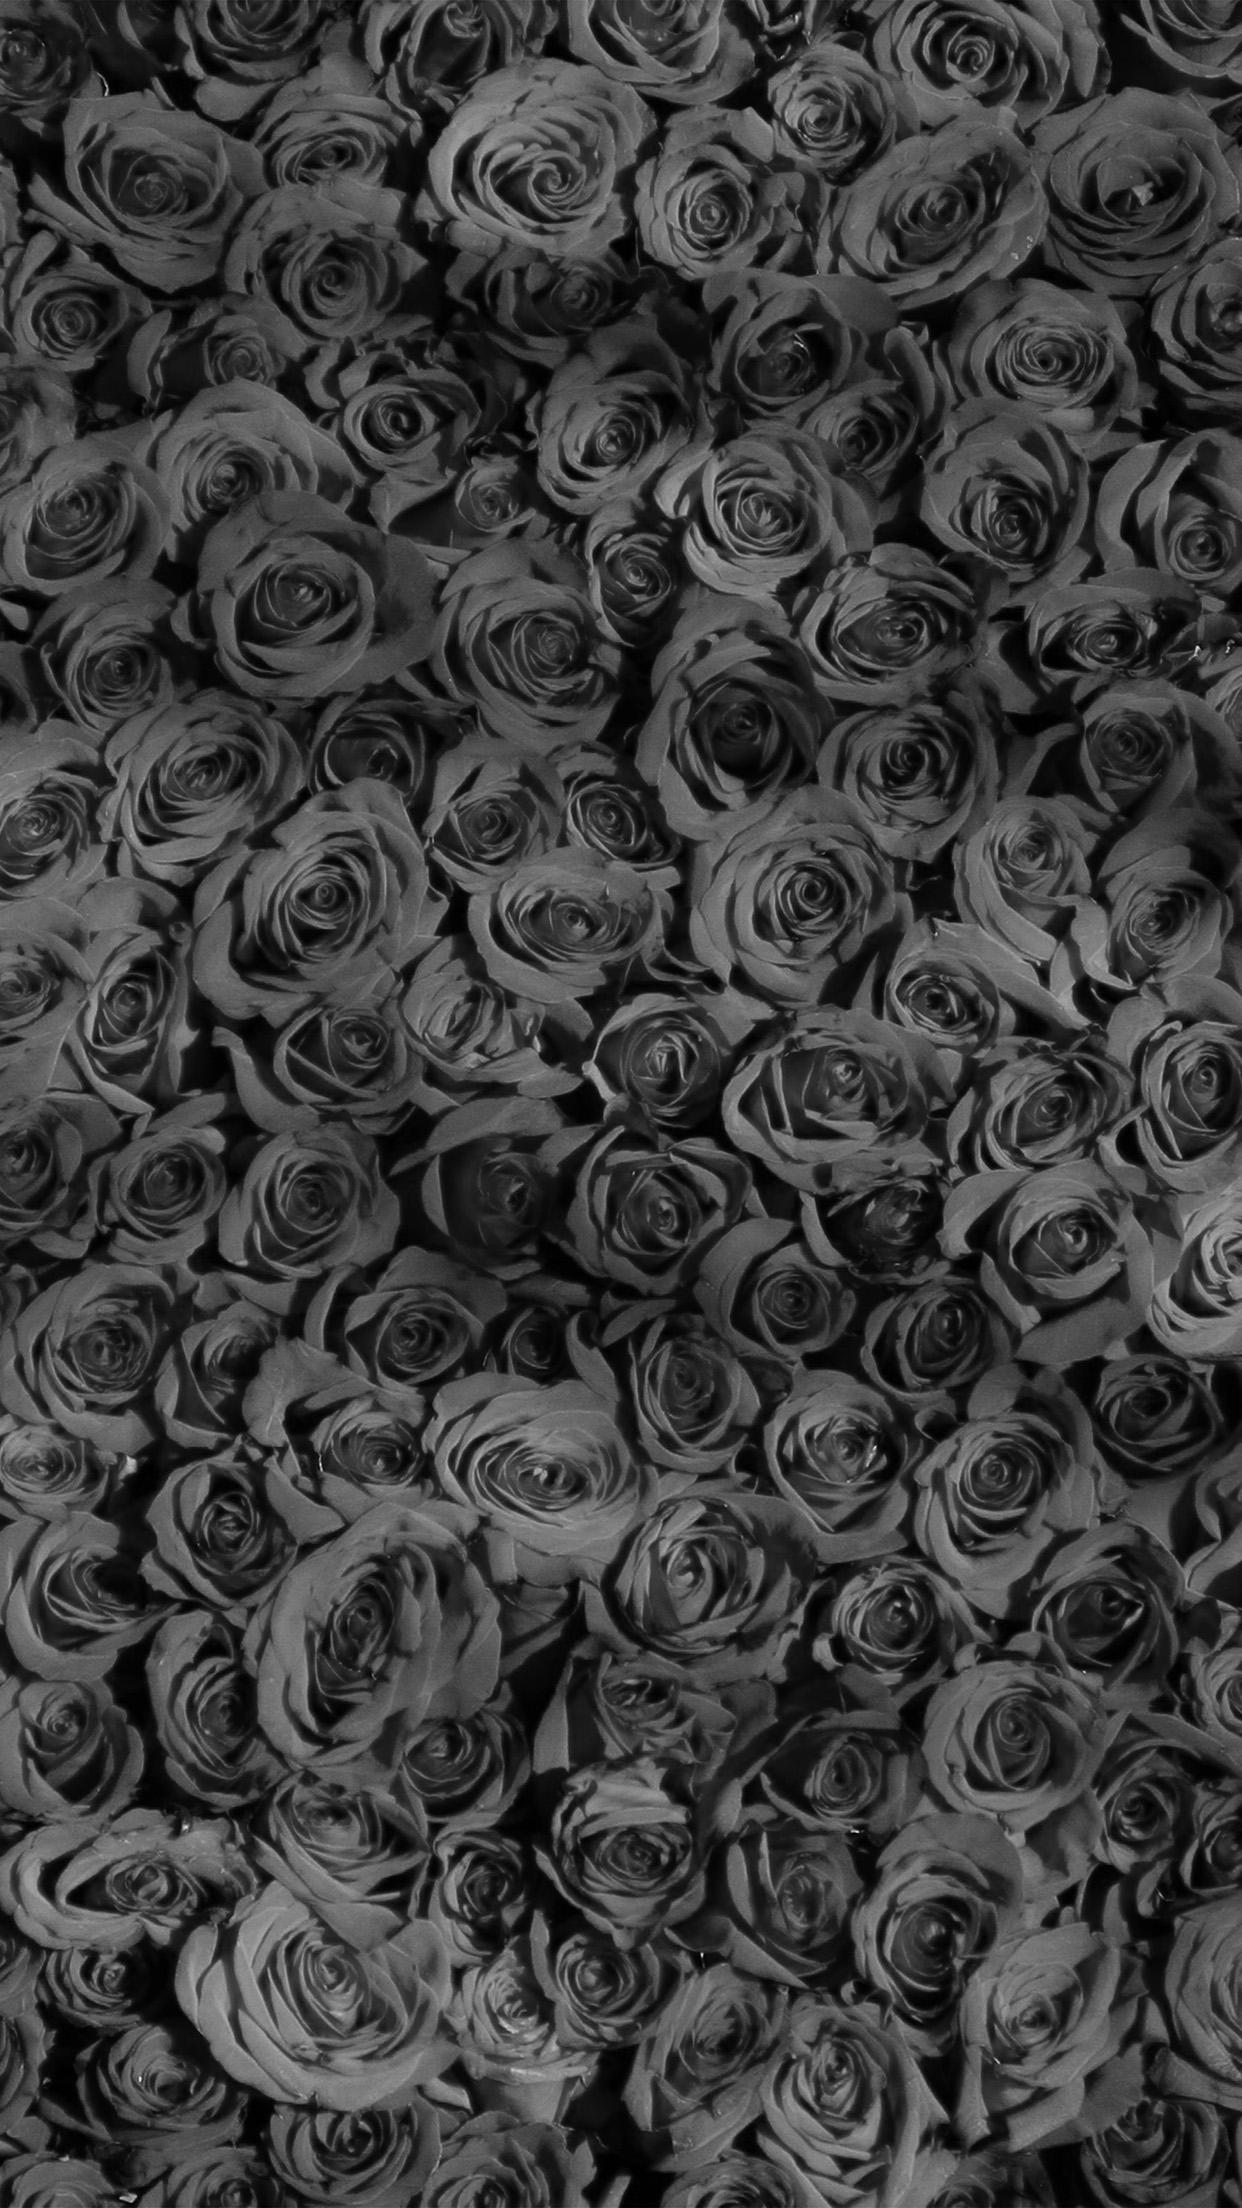 Ultra Hd Galaxy Wallpaper Vo45 Rose Dark Bw Pattern Wallpaper